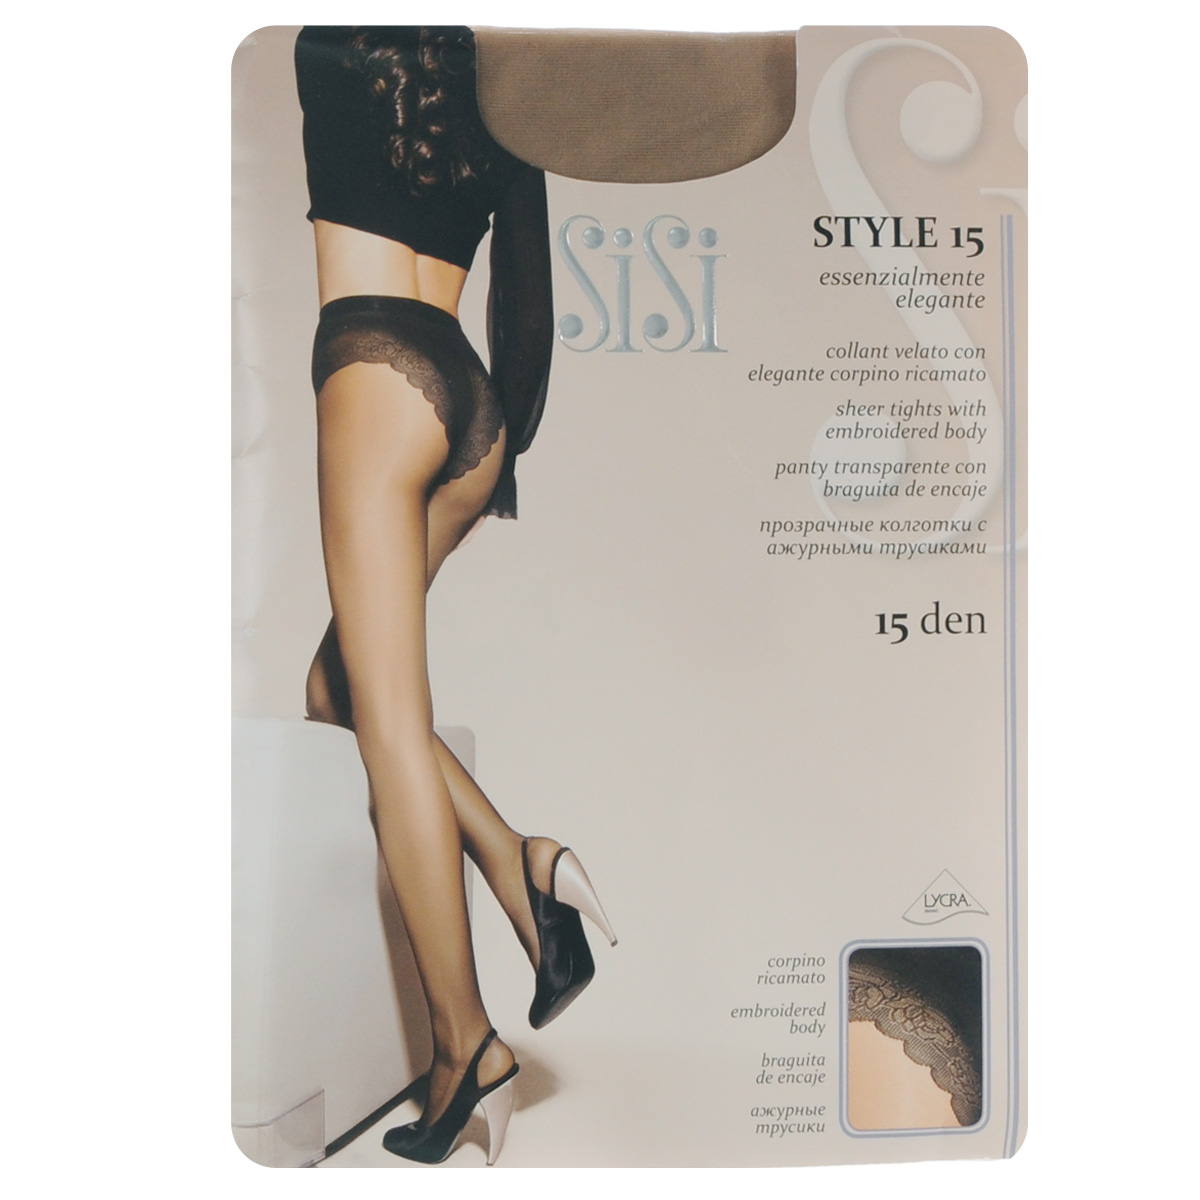 Колготки женские Sisi Style 15, цвет: Miele (бледно-коричневый). 45. Размер 2 (S) колготки sisi style размер 2 плотность 15 den nero